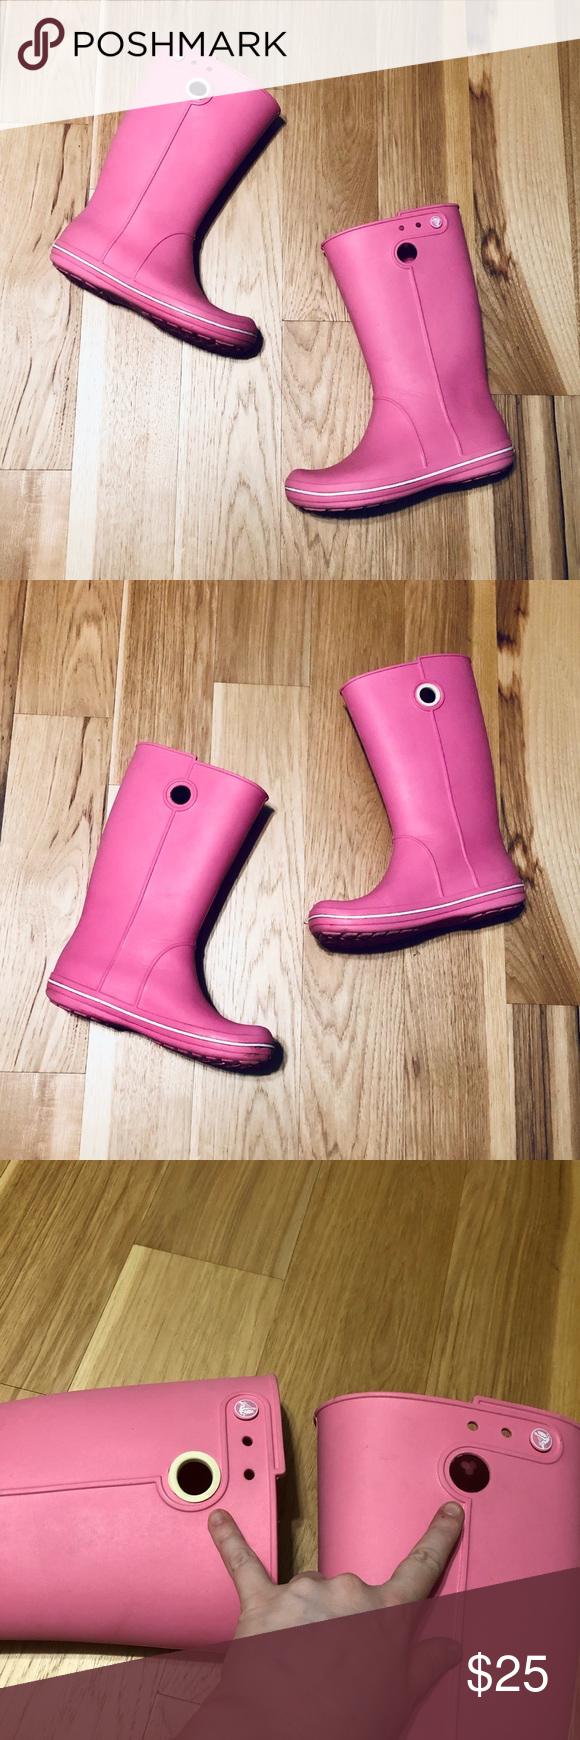 Crocs Crocband Rain Boots In Pink Lemonade New Style